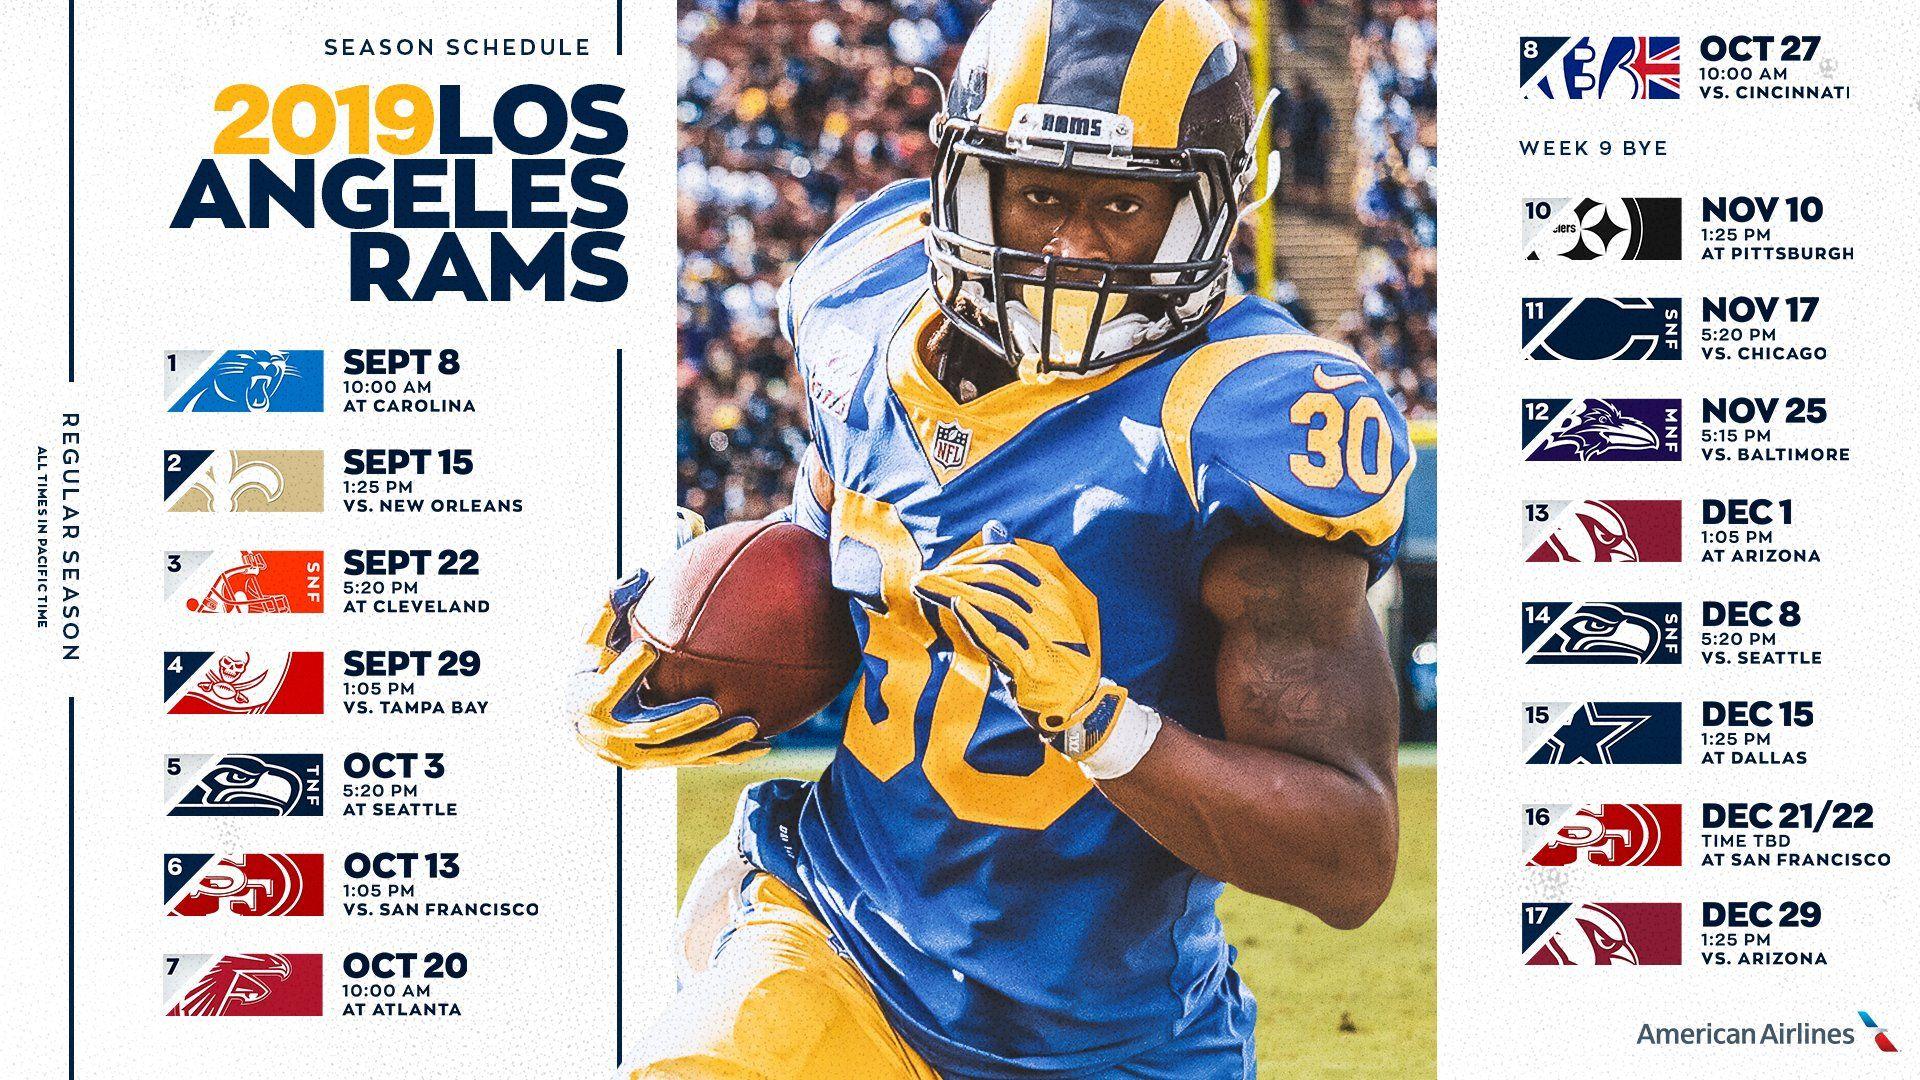 Los Angeles Rams Football Games 2019 Rams Football Los Angeles Rams Football Games